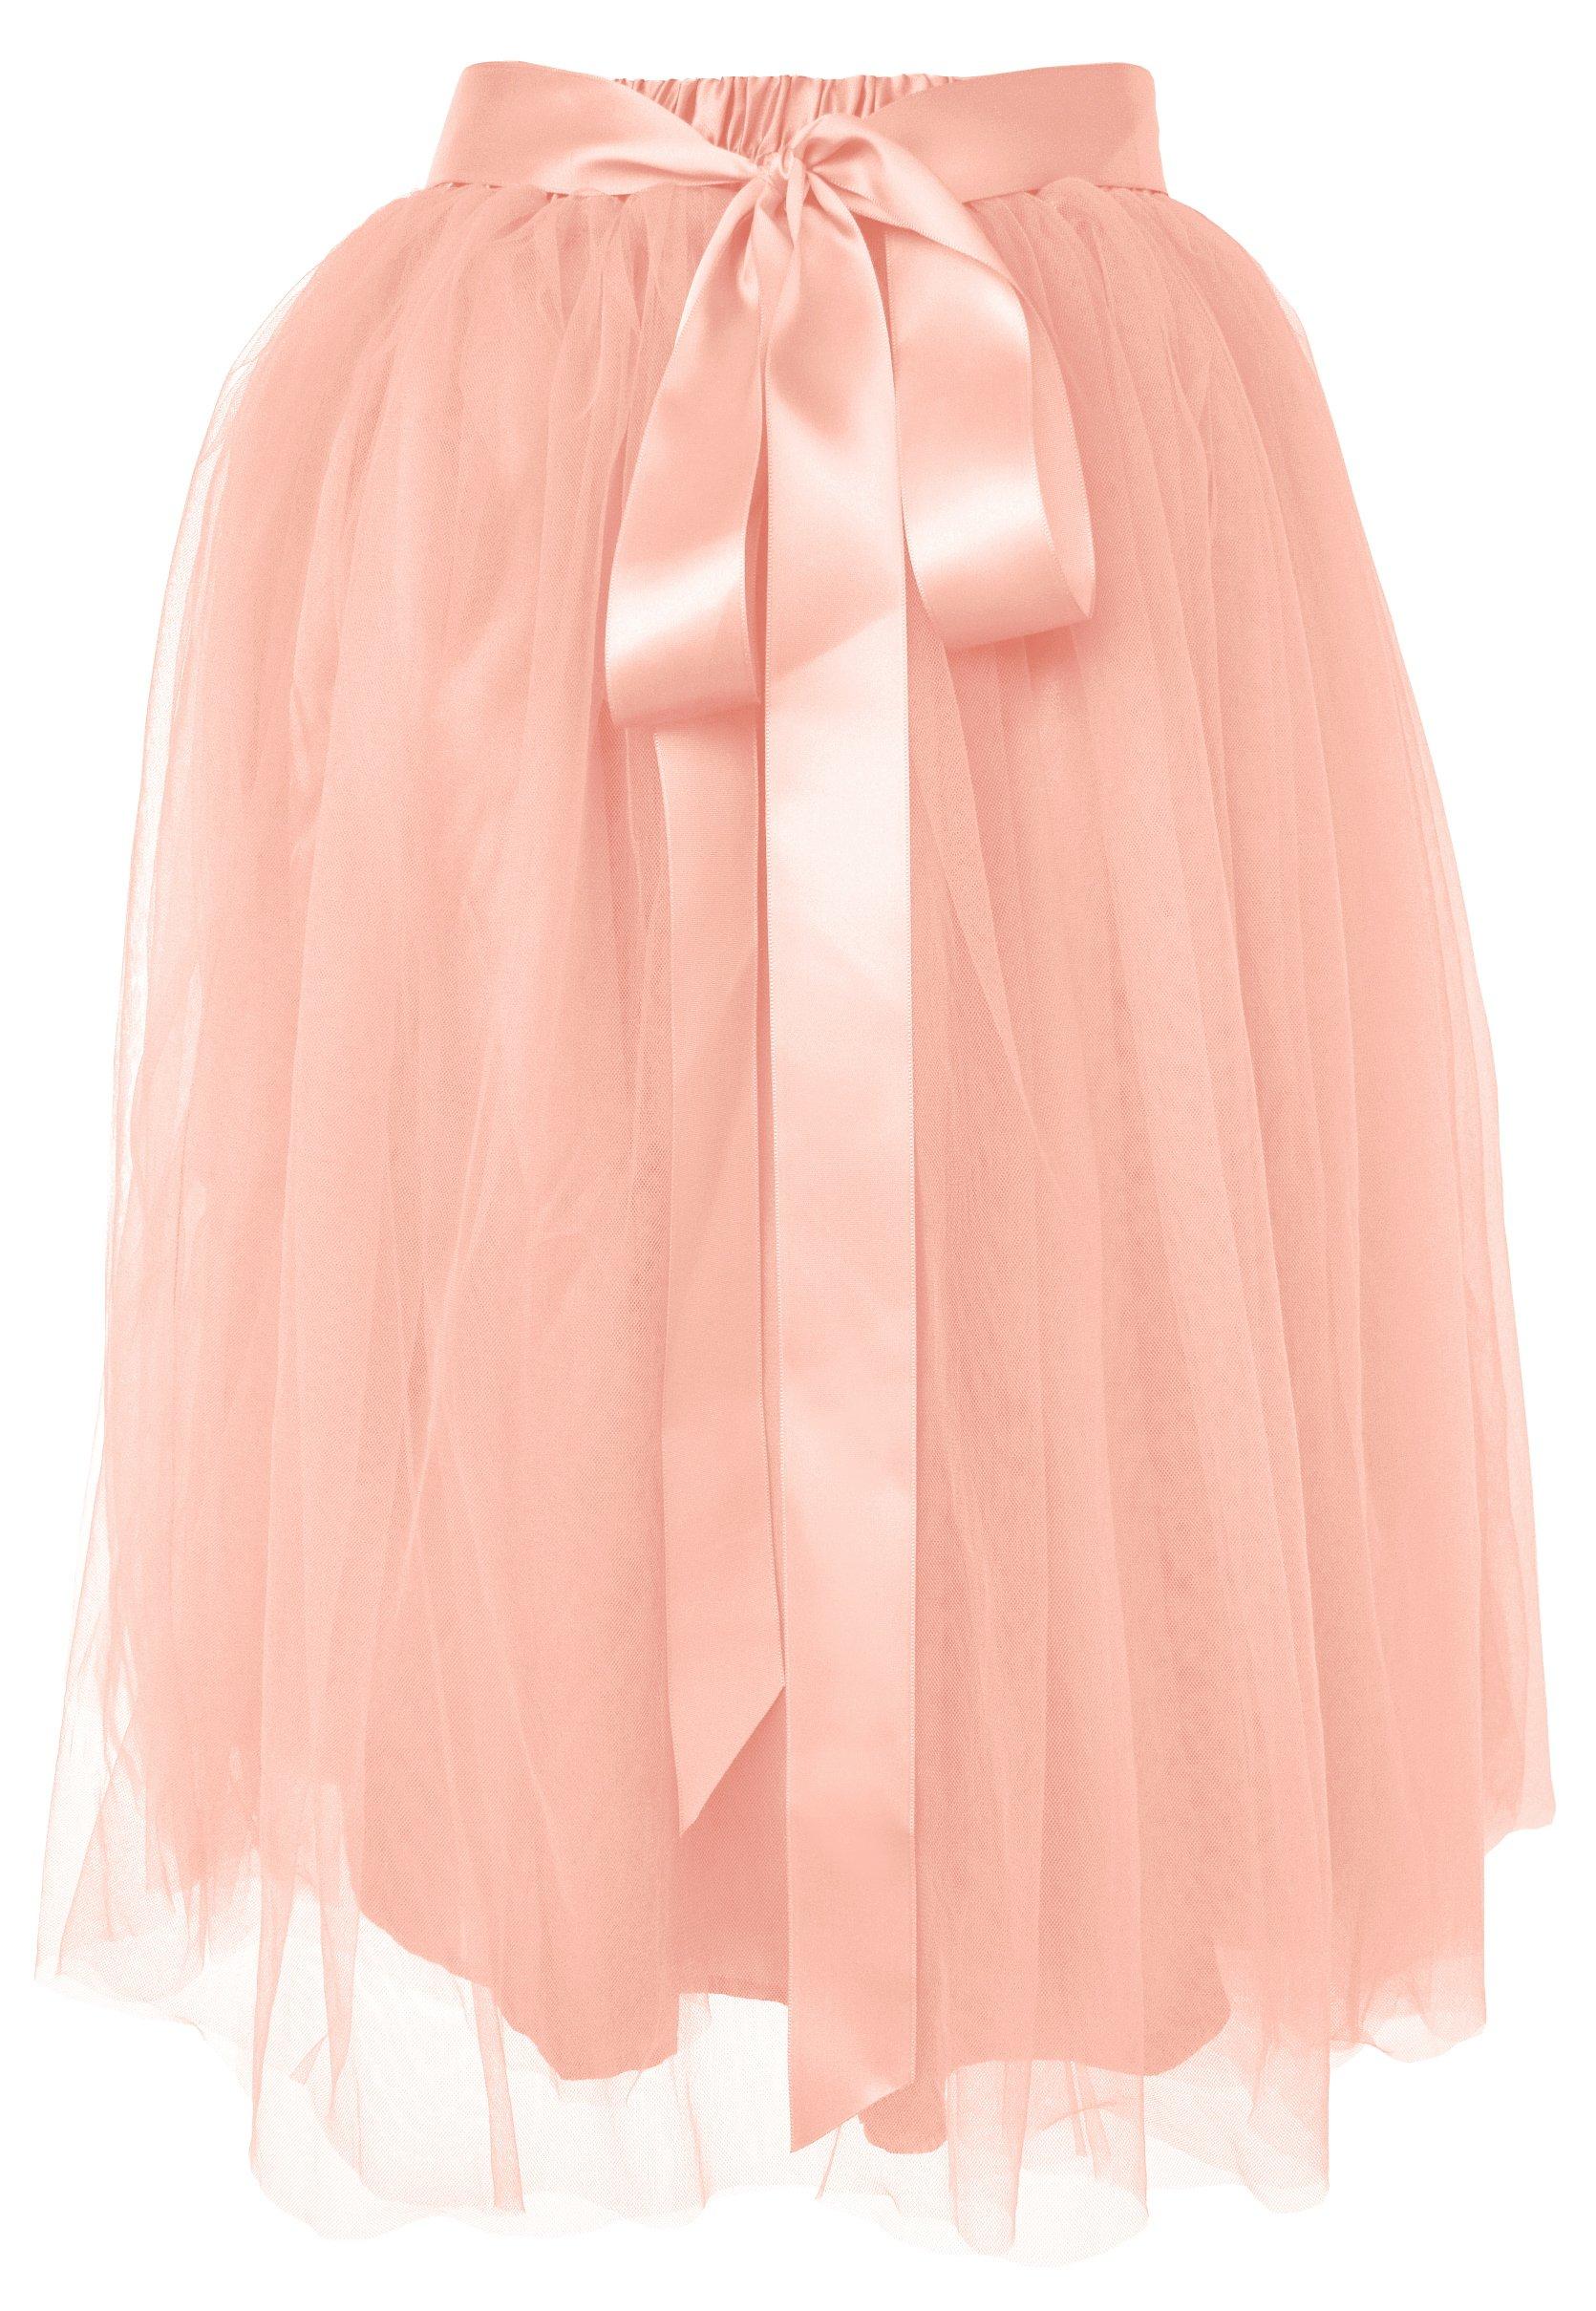 Dancina Women's Knee Length Tutu A Line Layered Tulle Skirt Size Regular 2-18 Blushpink